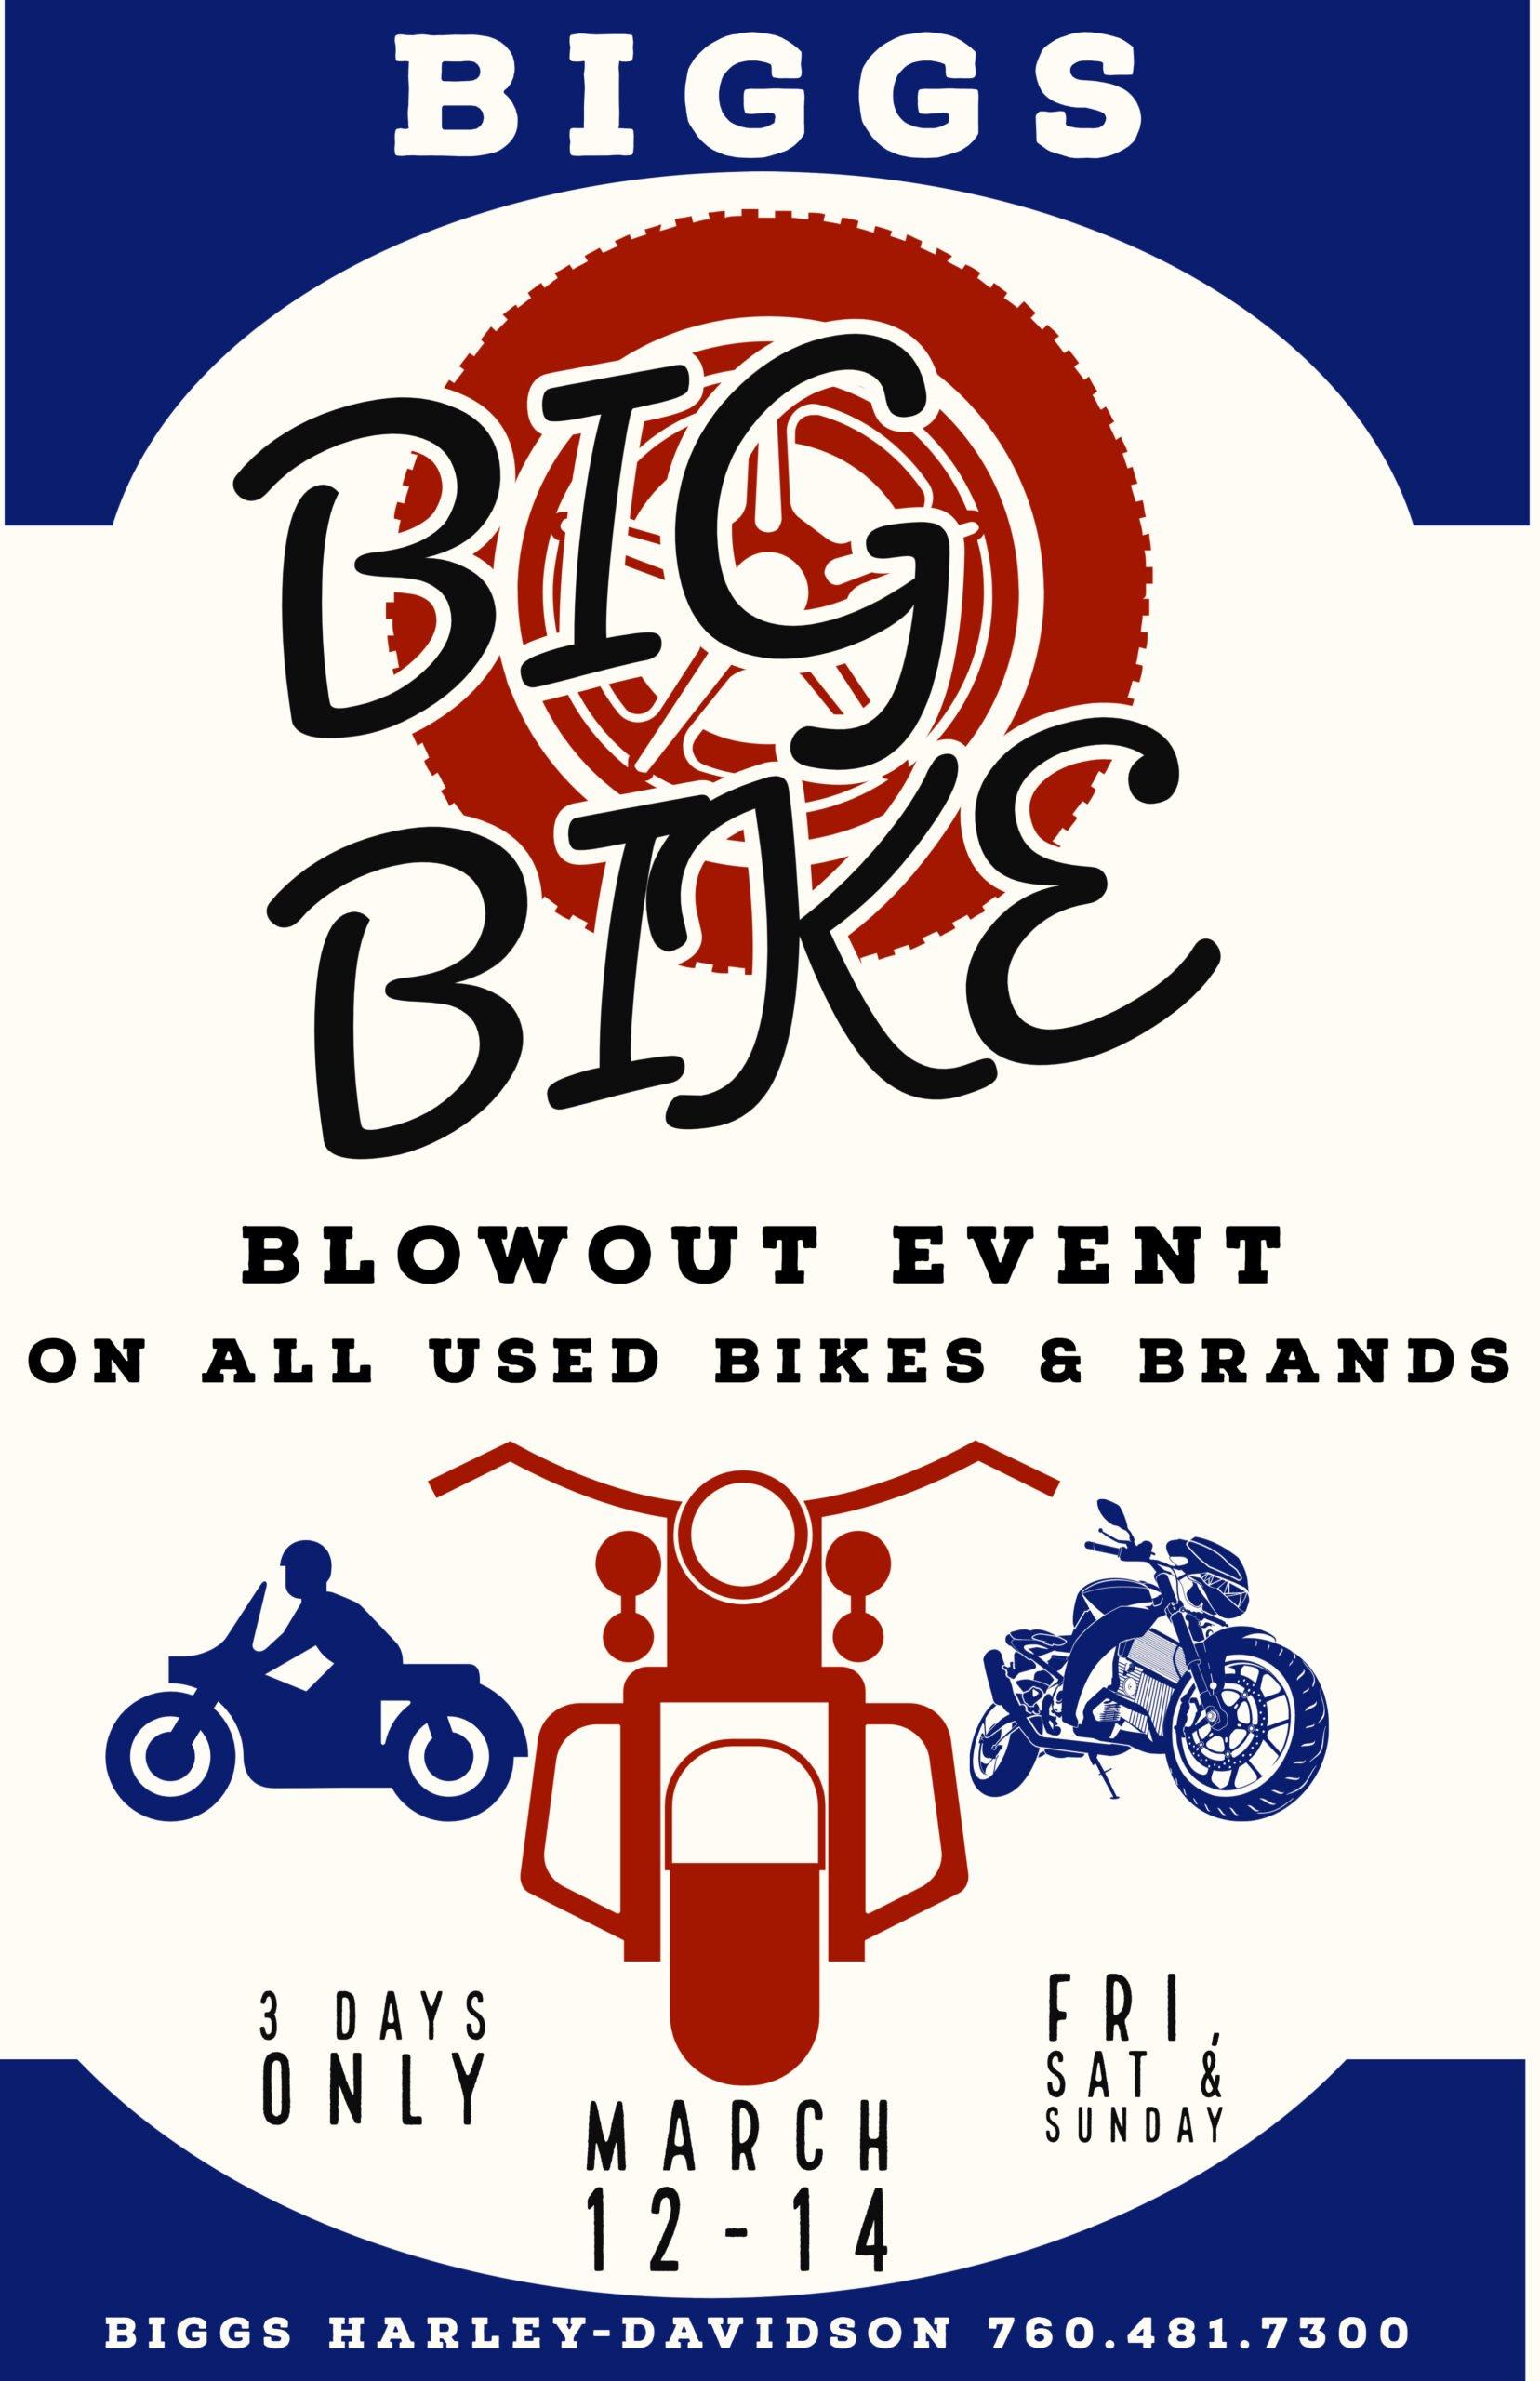 Biggs Big Used Bike Blowout Event